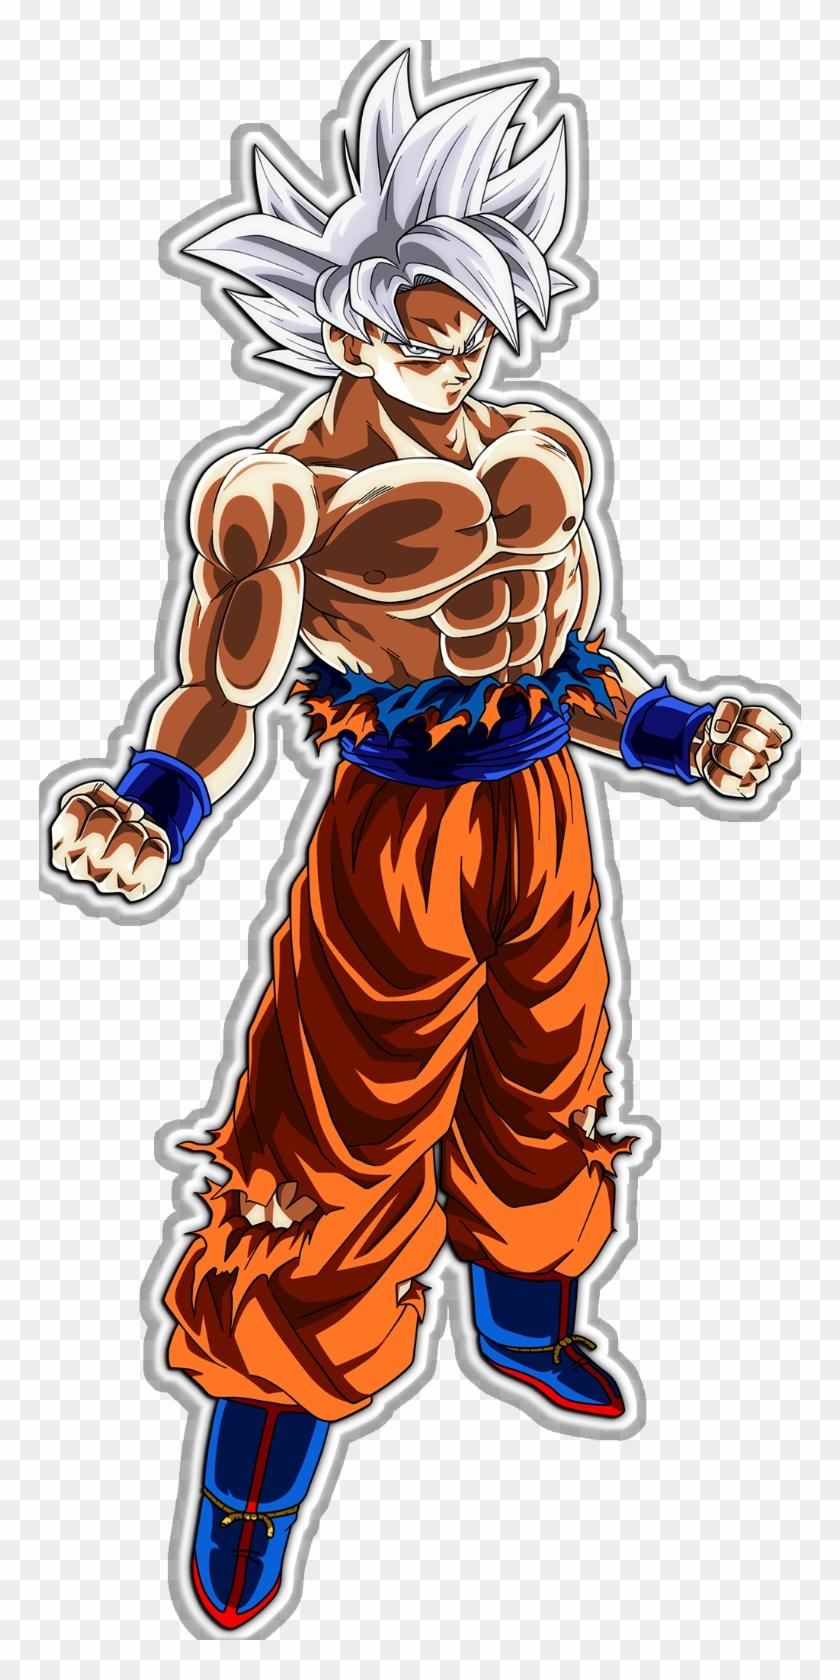 Dragonball Super Mastered Ultra Instinct Goku Decal.